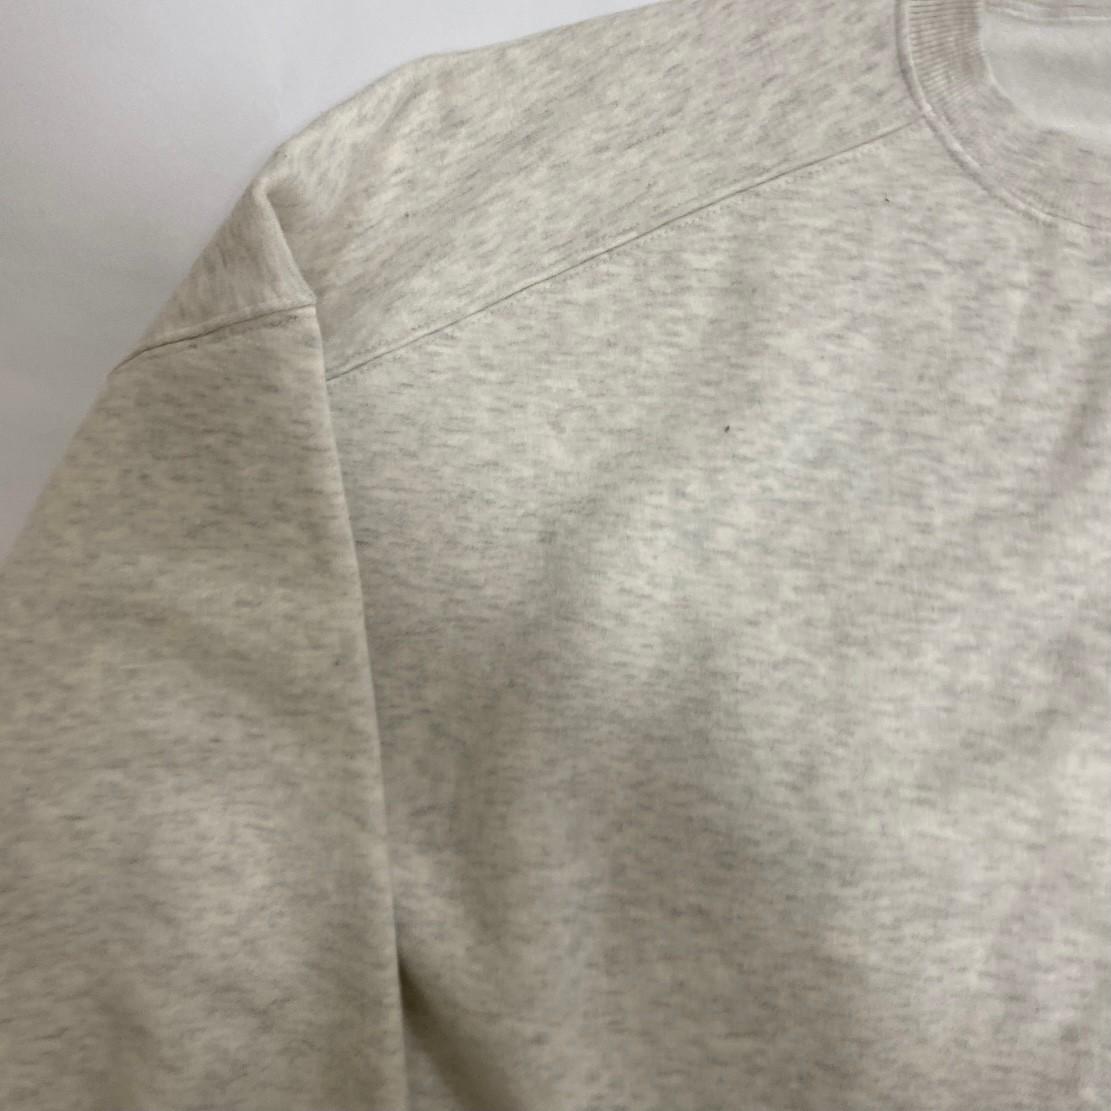 sweat shirt (set up)